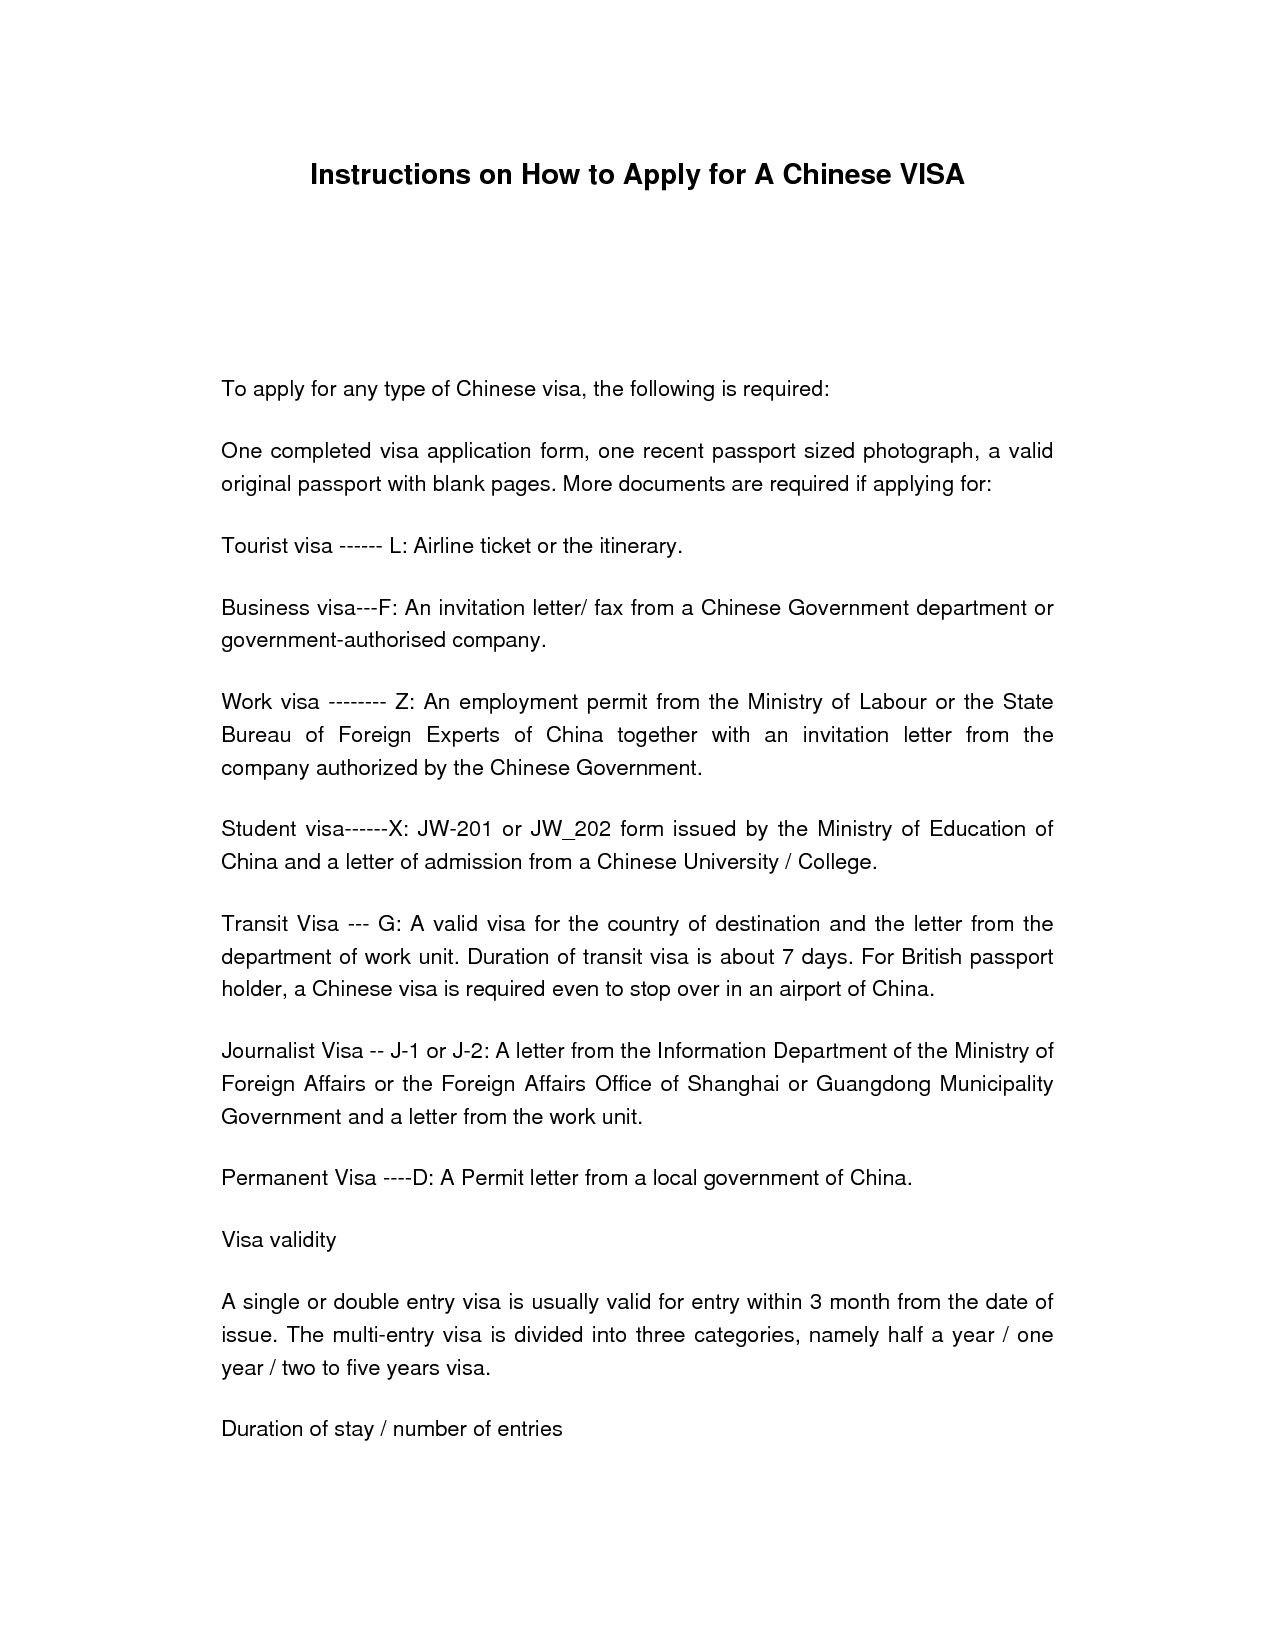 visa letter template Collection-Invitation Letter Samples For Uk Visa New Letter Invitation For Uk Visa Template Best Solutions Sample 6-t